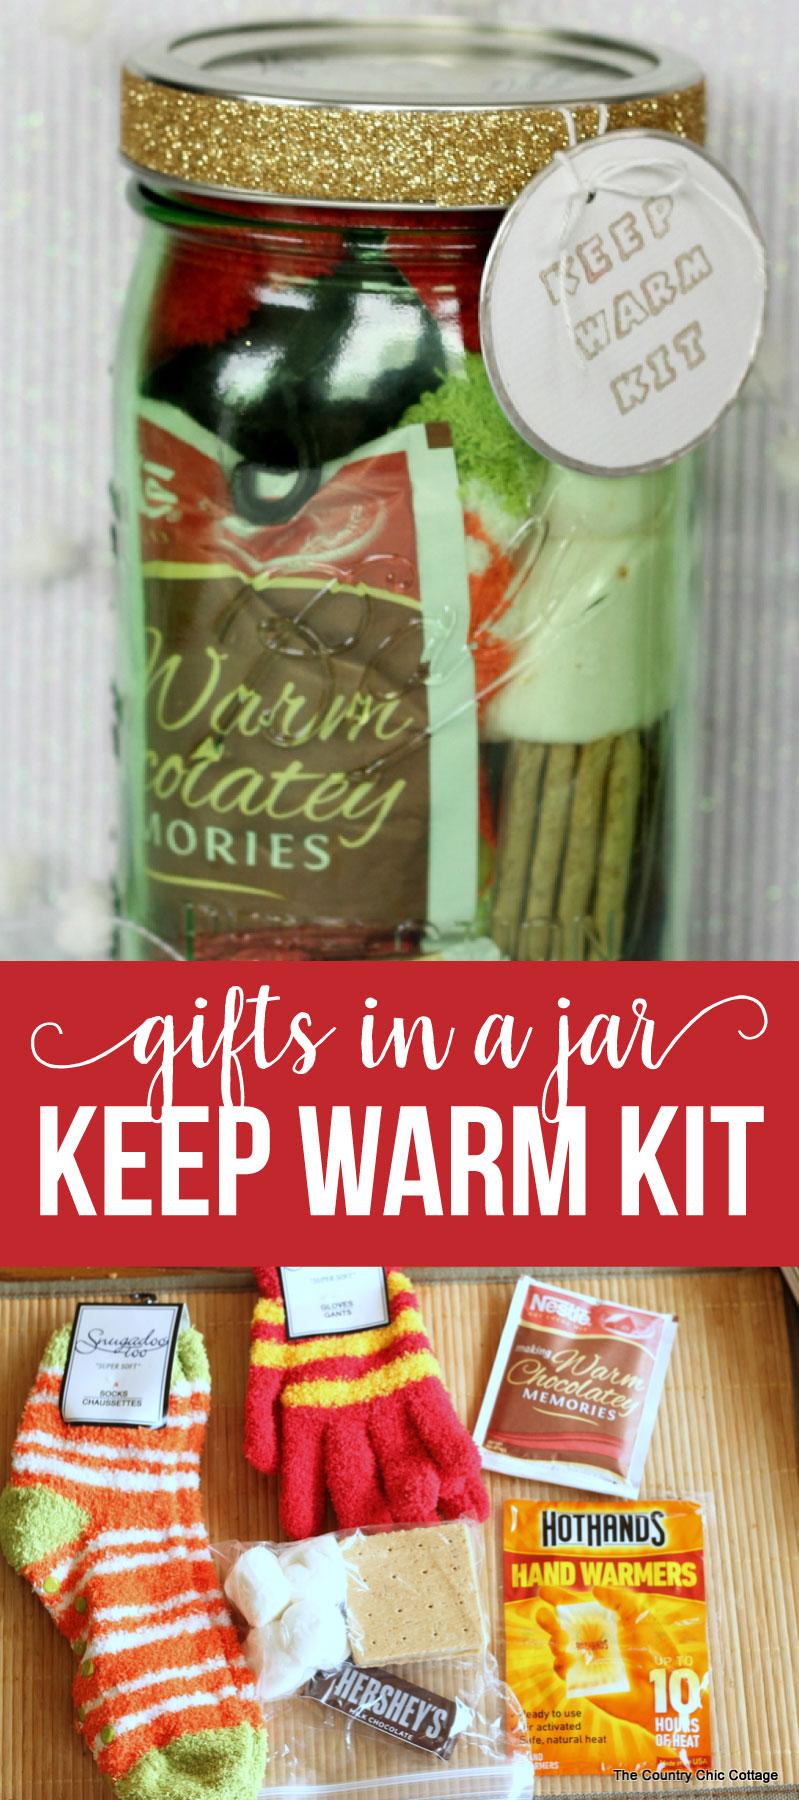 Keep Warm Kit - Gifts in a Jar .. a good Christmas gift idea for friends! via www.thirtyhandmadedays.com